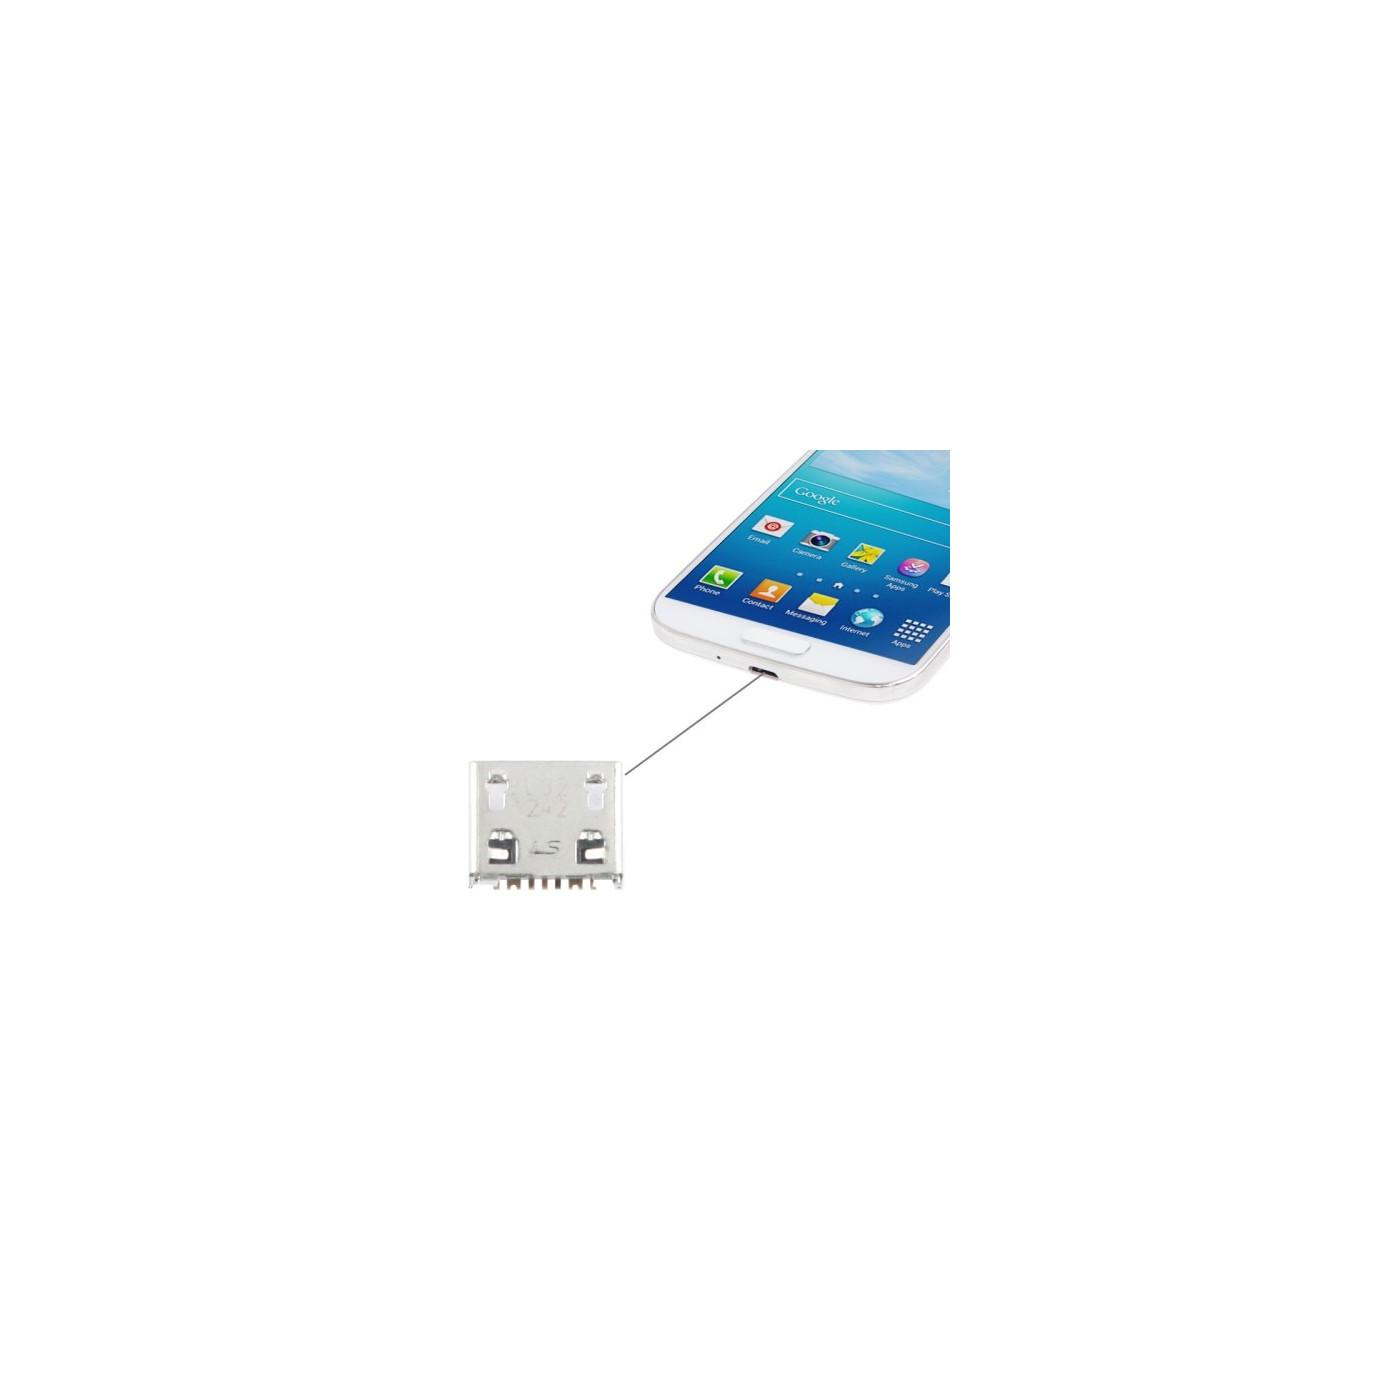 Connettore ricarica per Galaxy Mega 5.8 i9150 dock carica dati